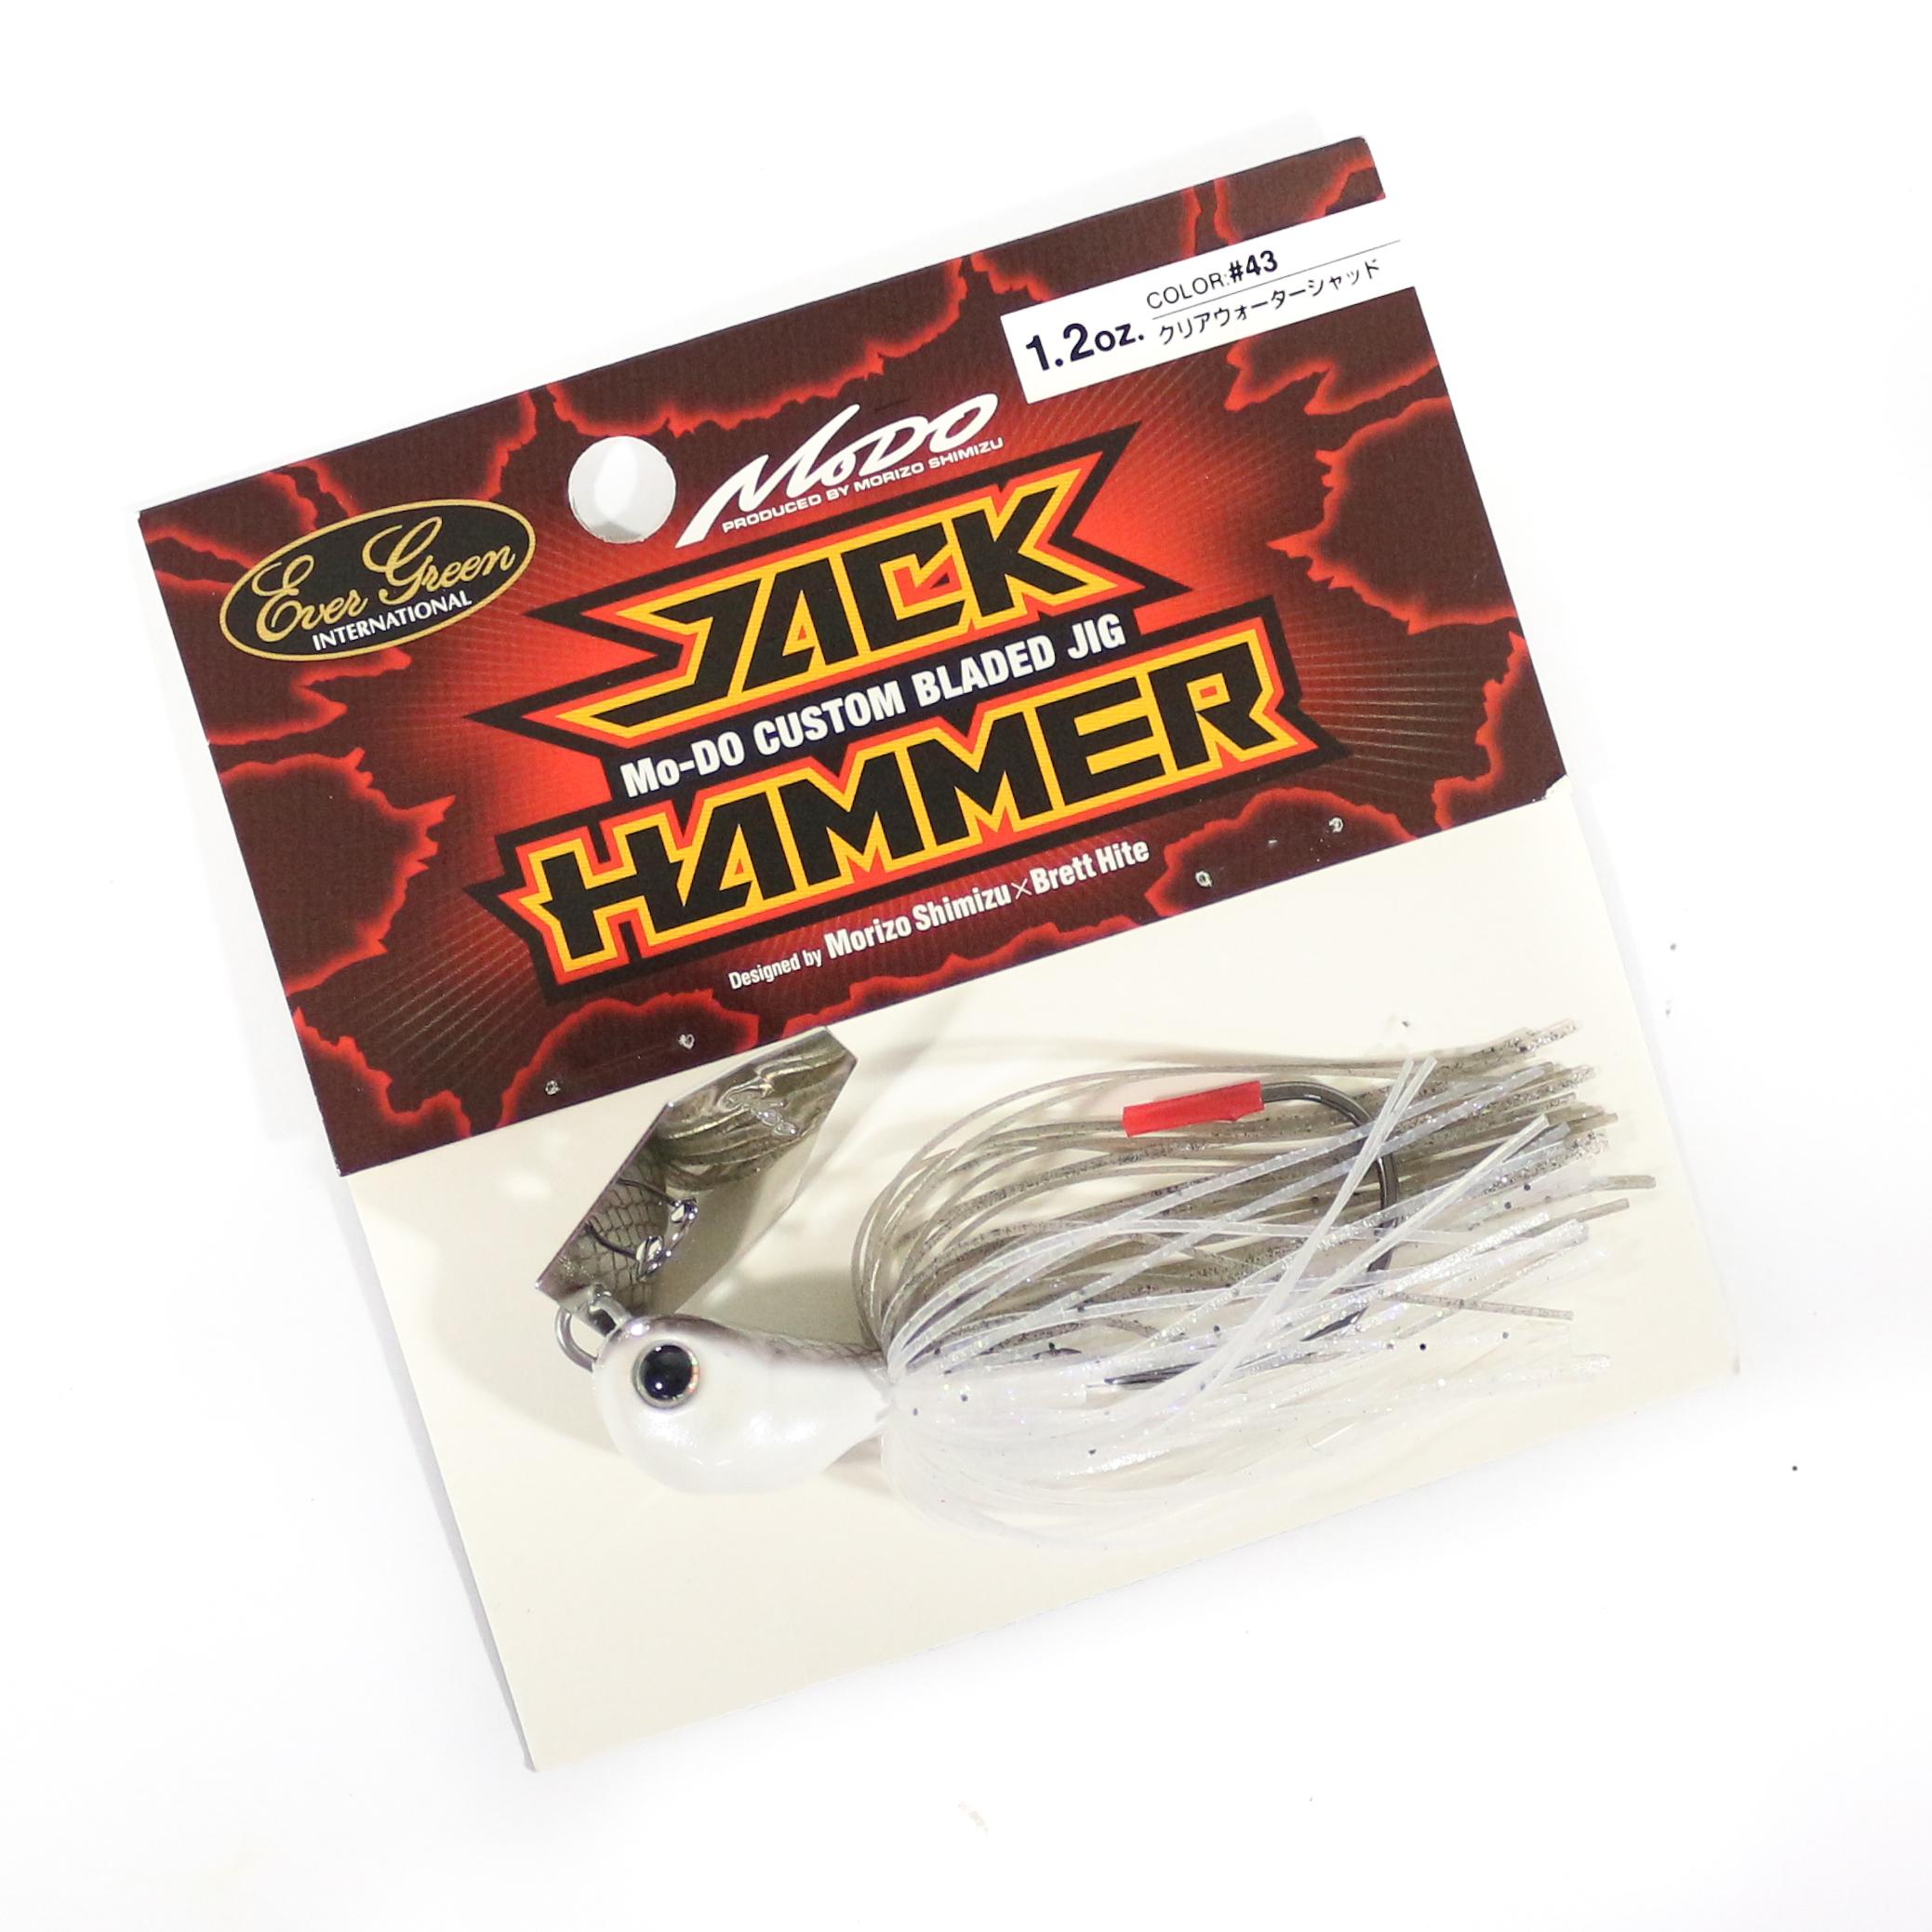 Evergreen Jackhammer Bladed Jig 1.2 oz Sinking Lure 43 (4501)